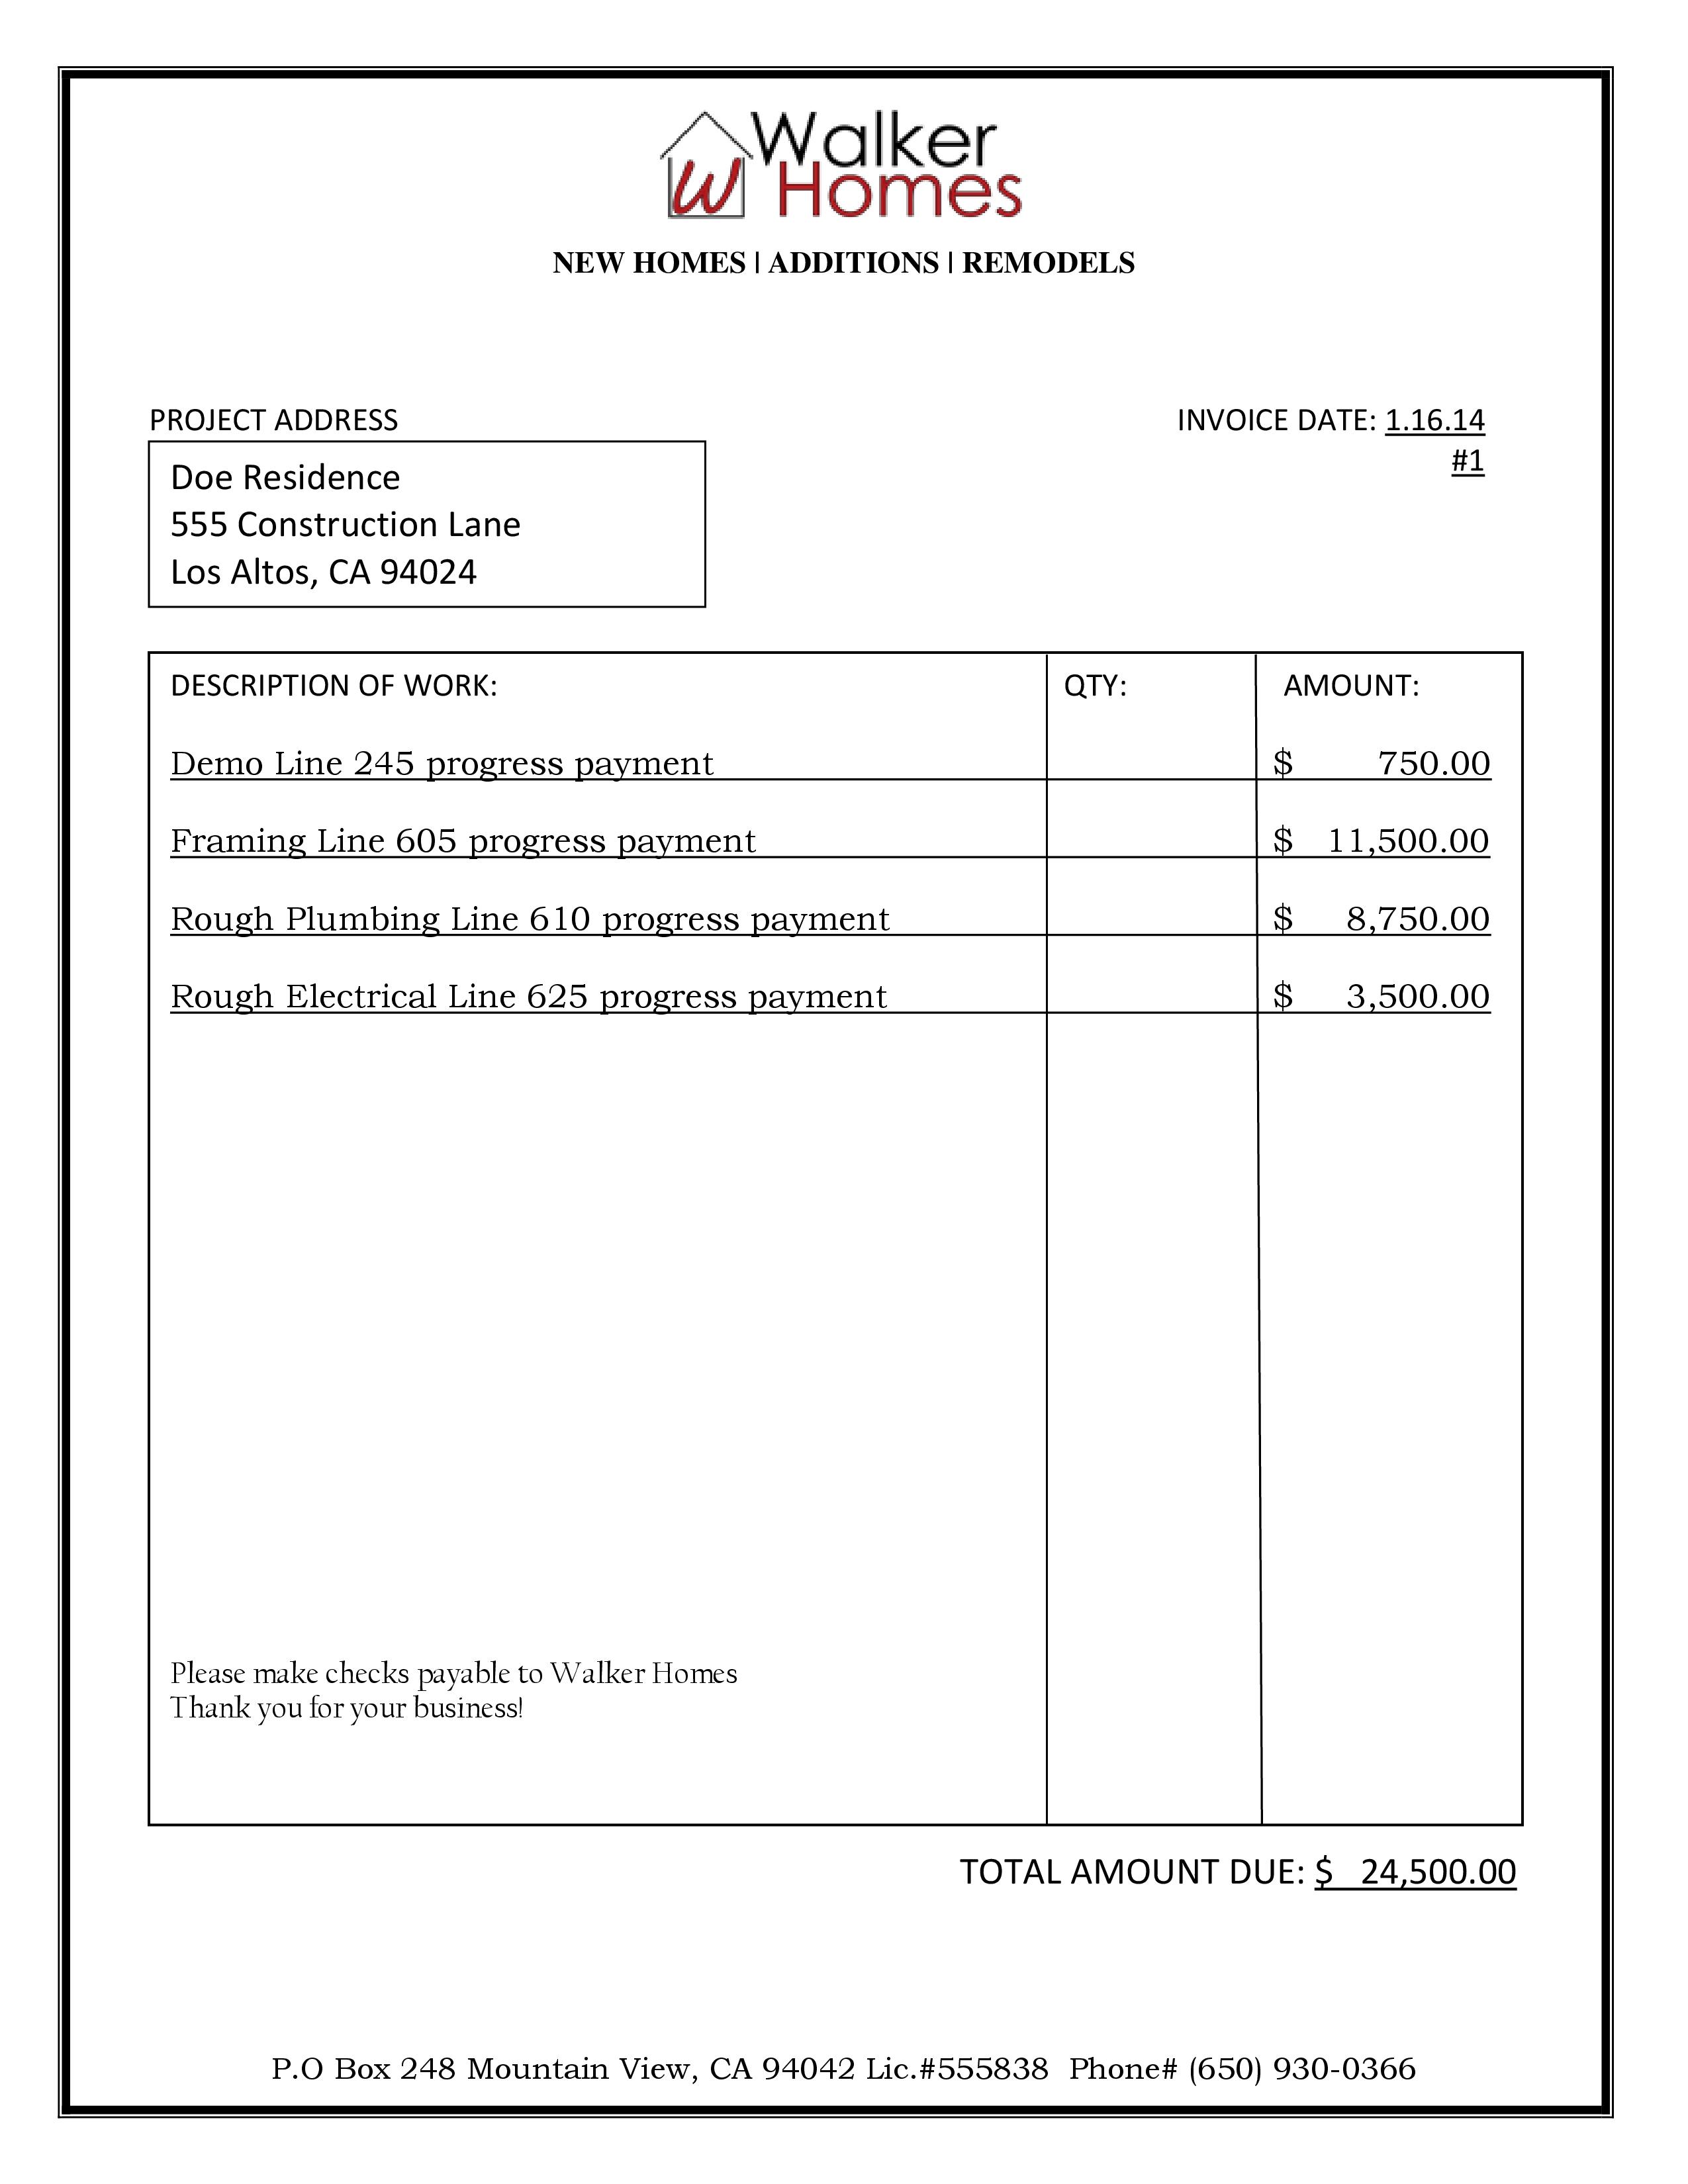 sample bid amp billing walker homes sample construction invoice